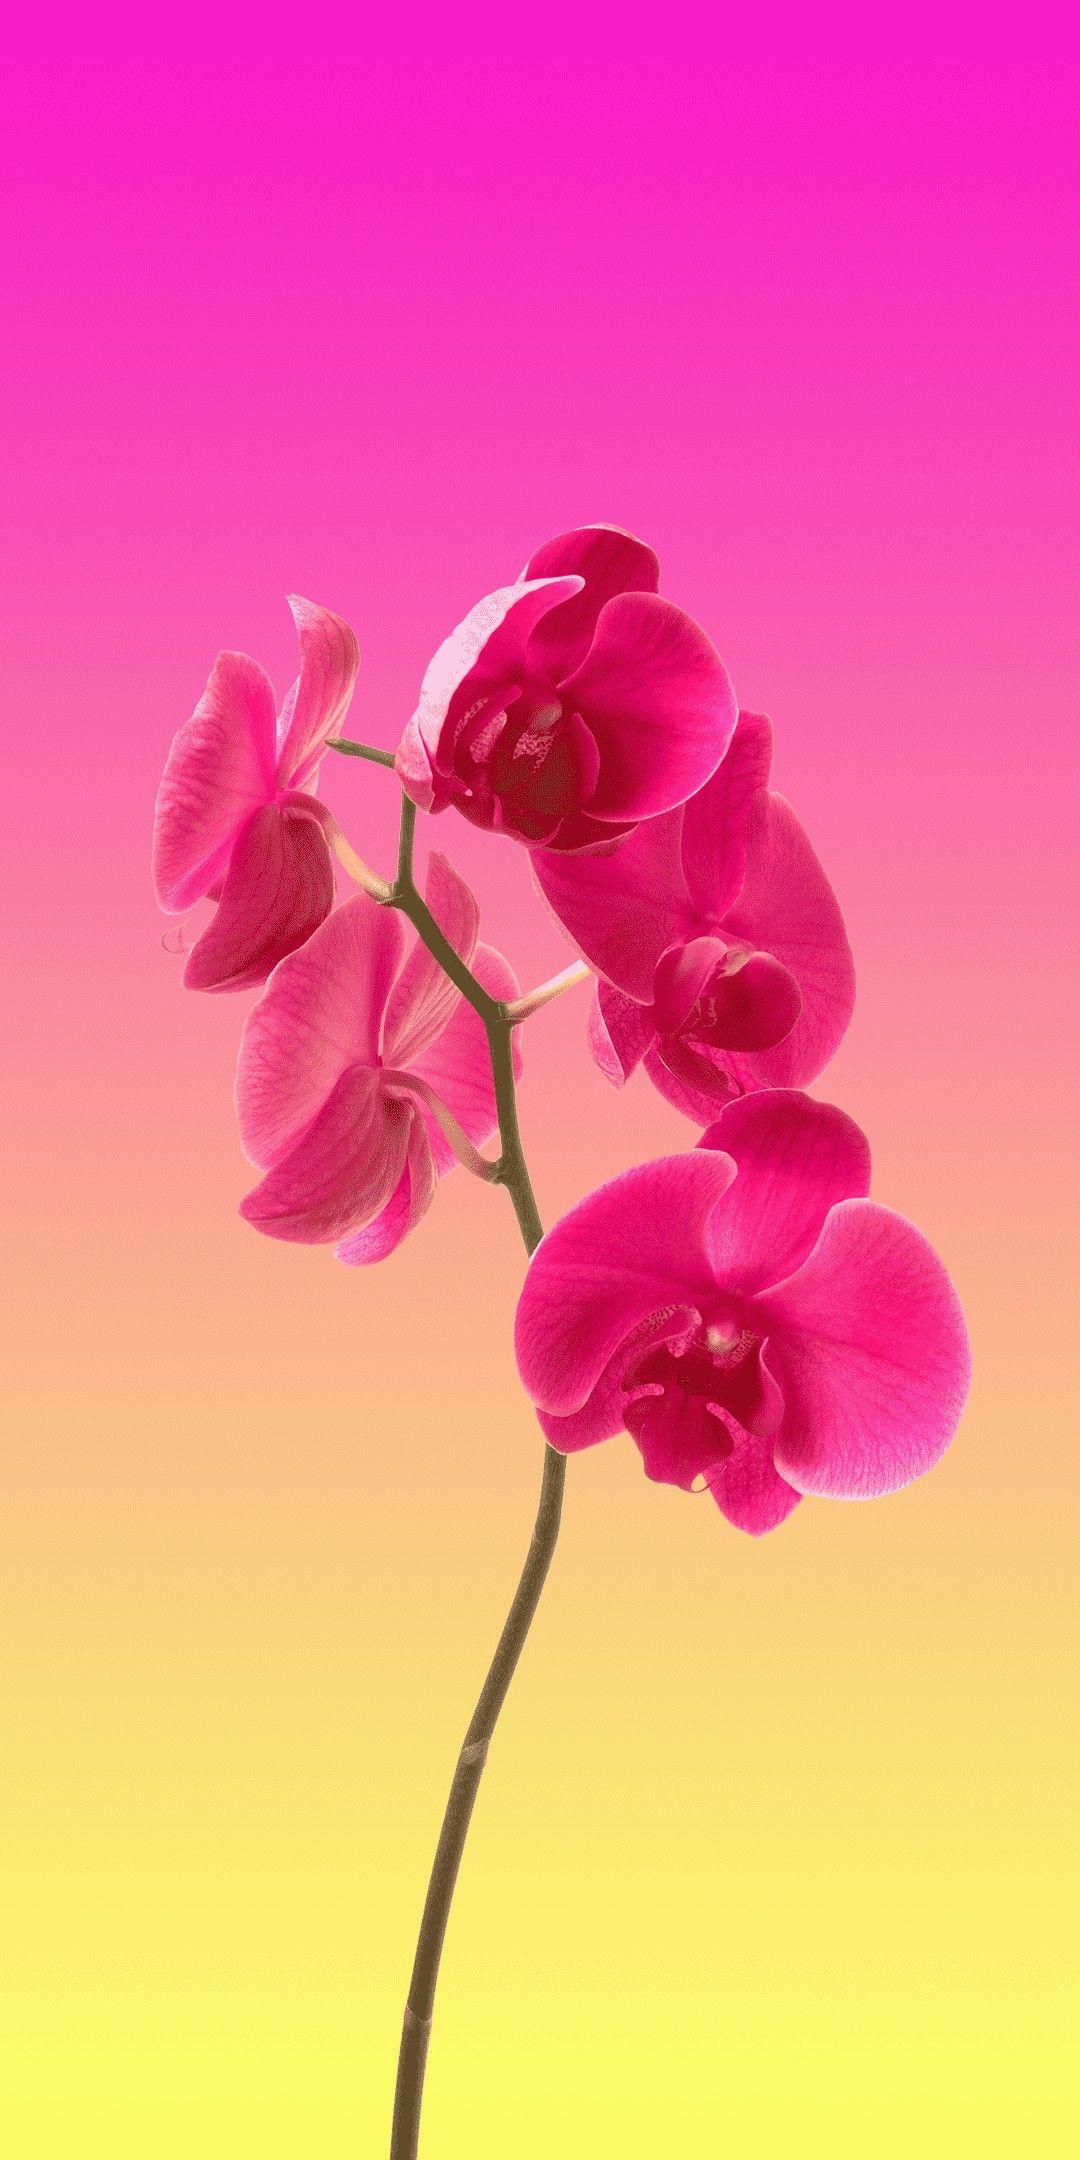 Orchid Minimal Wallpaper 1080x2160 Wallpaper Nature Flowers Orchid Wallpaper Hd Flower Wallpaper